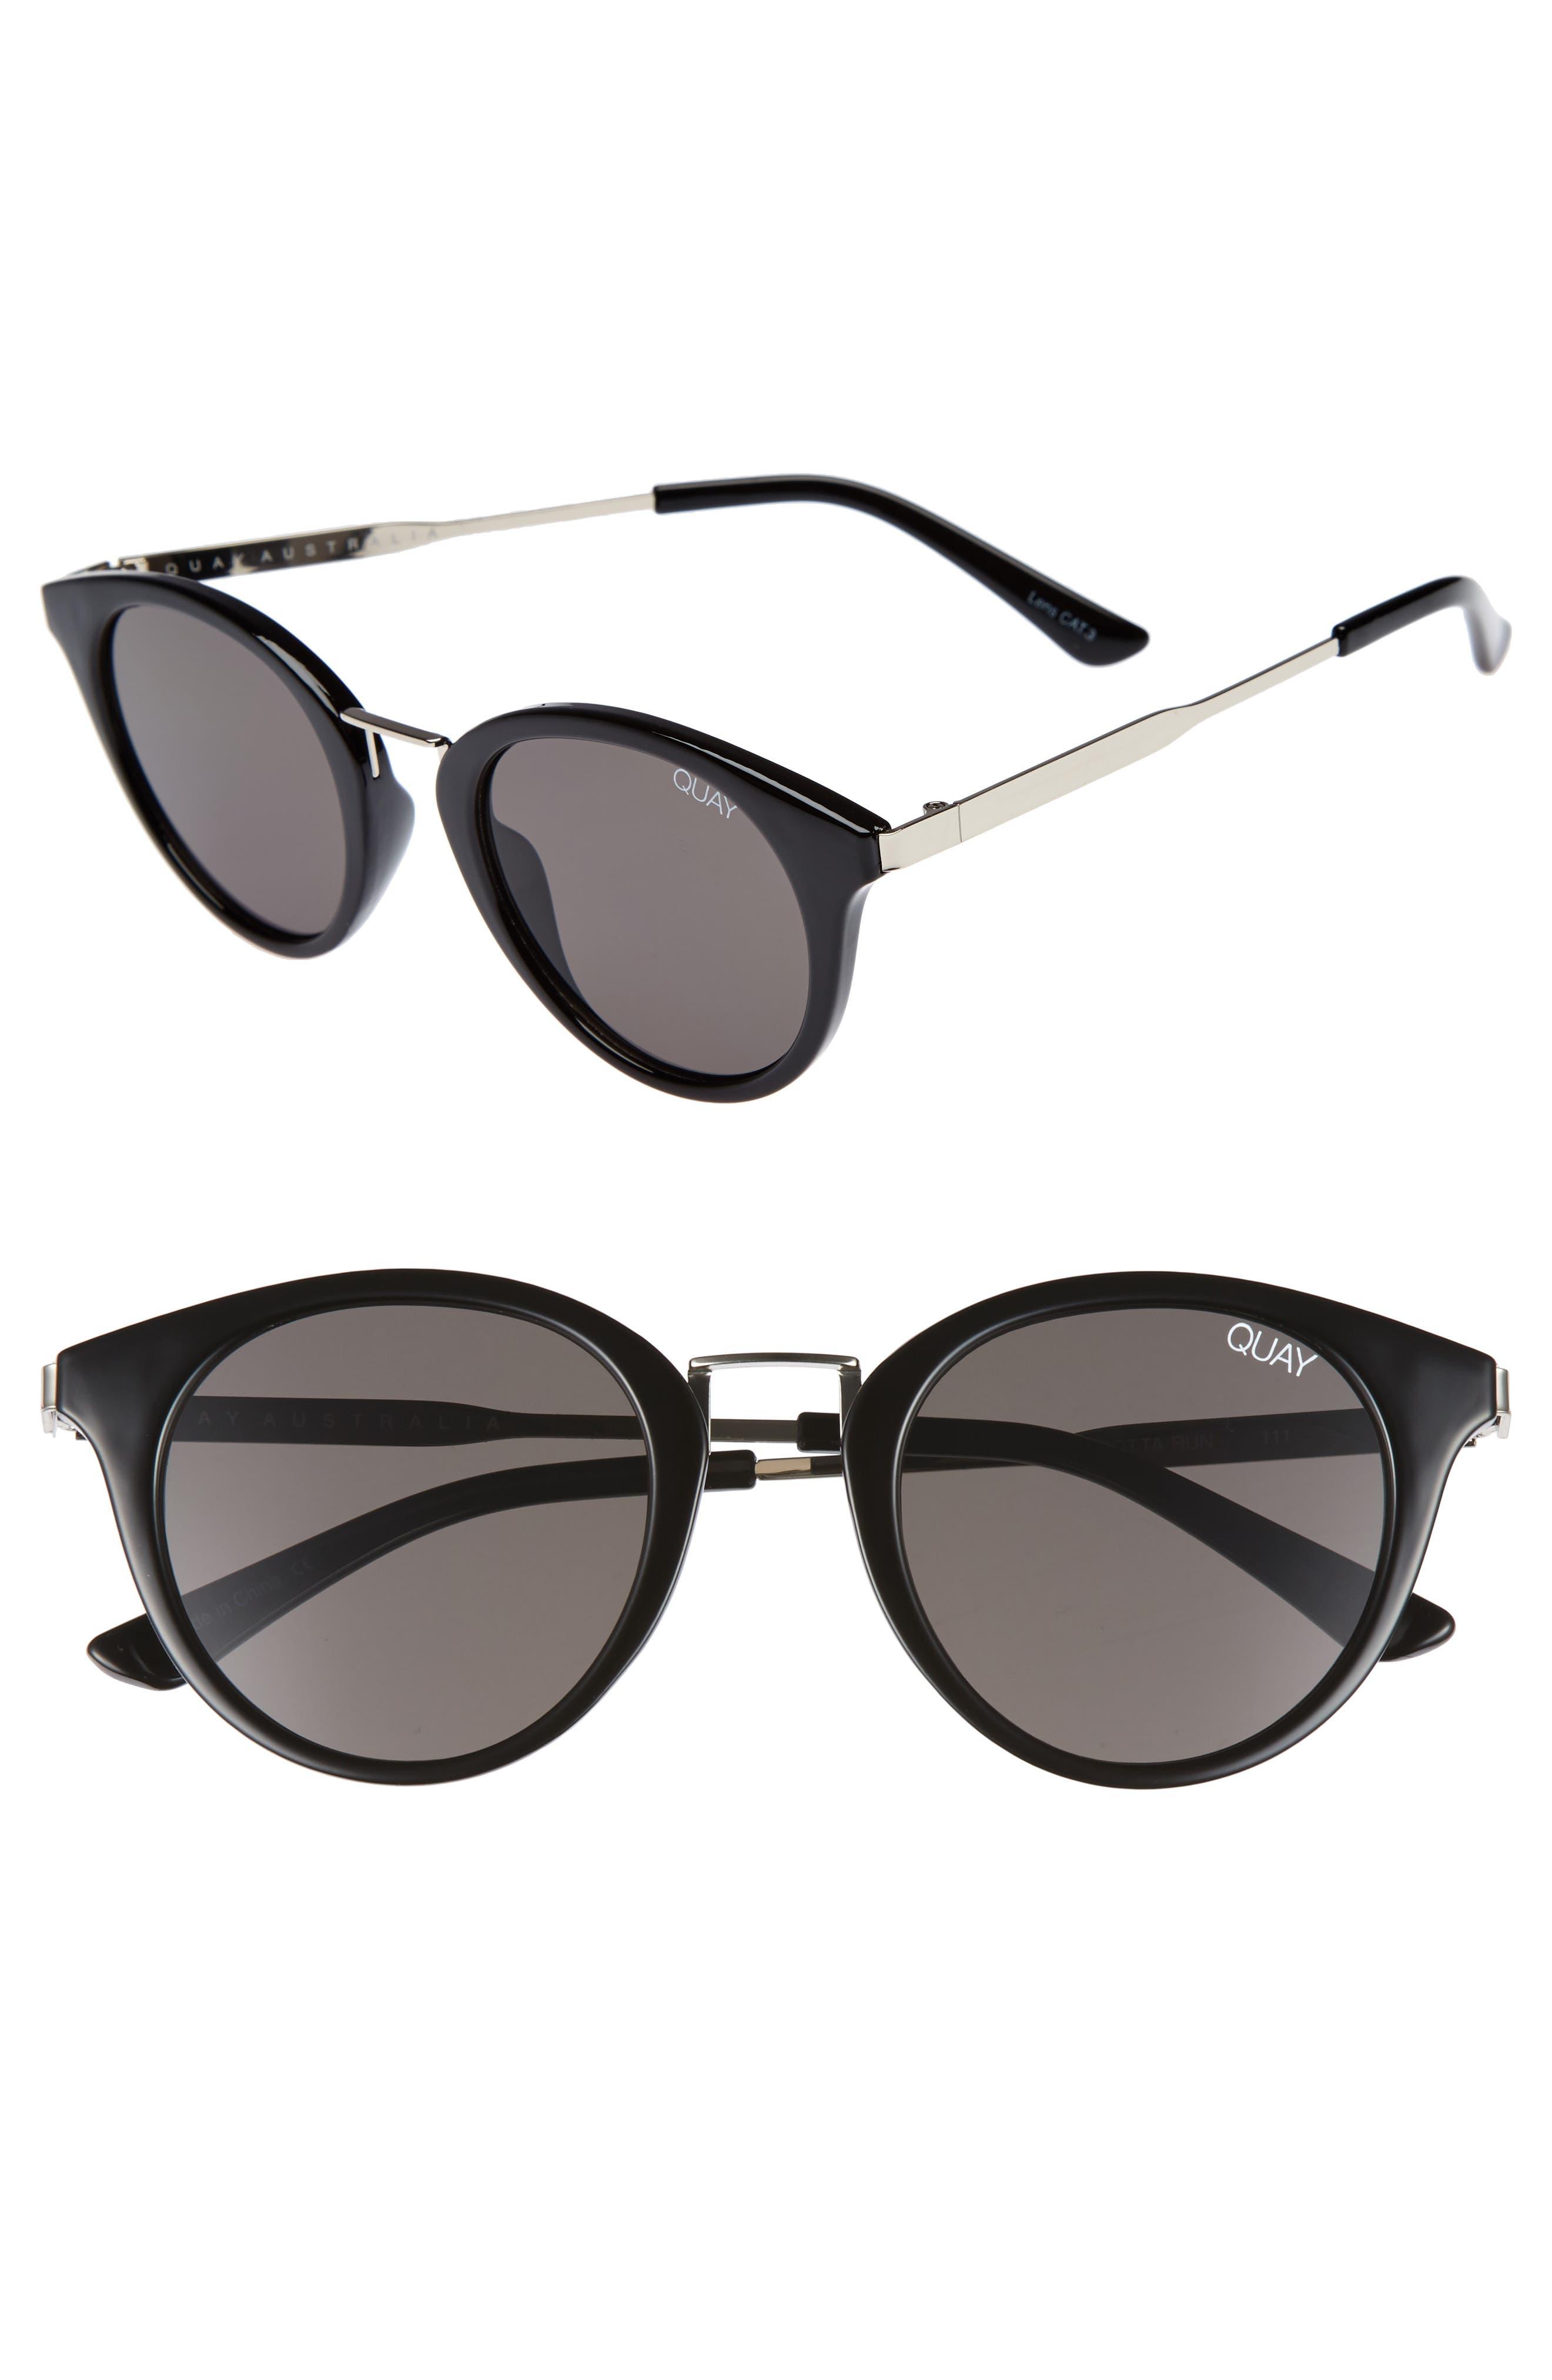 Gotta Run 48mm Sunglasses,                             Main thumbnail 1, color,                             001